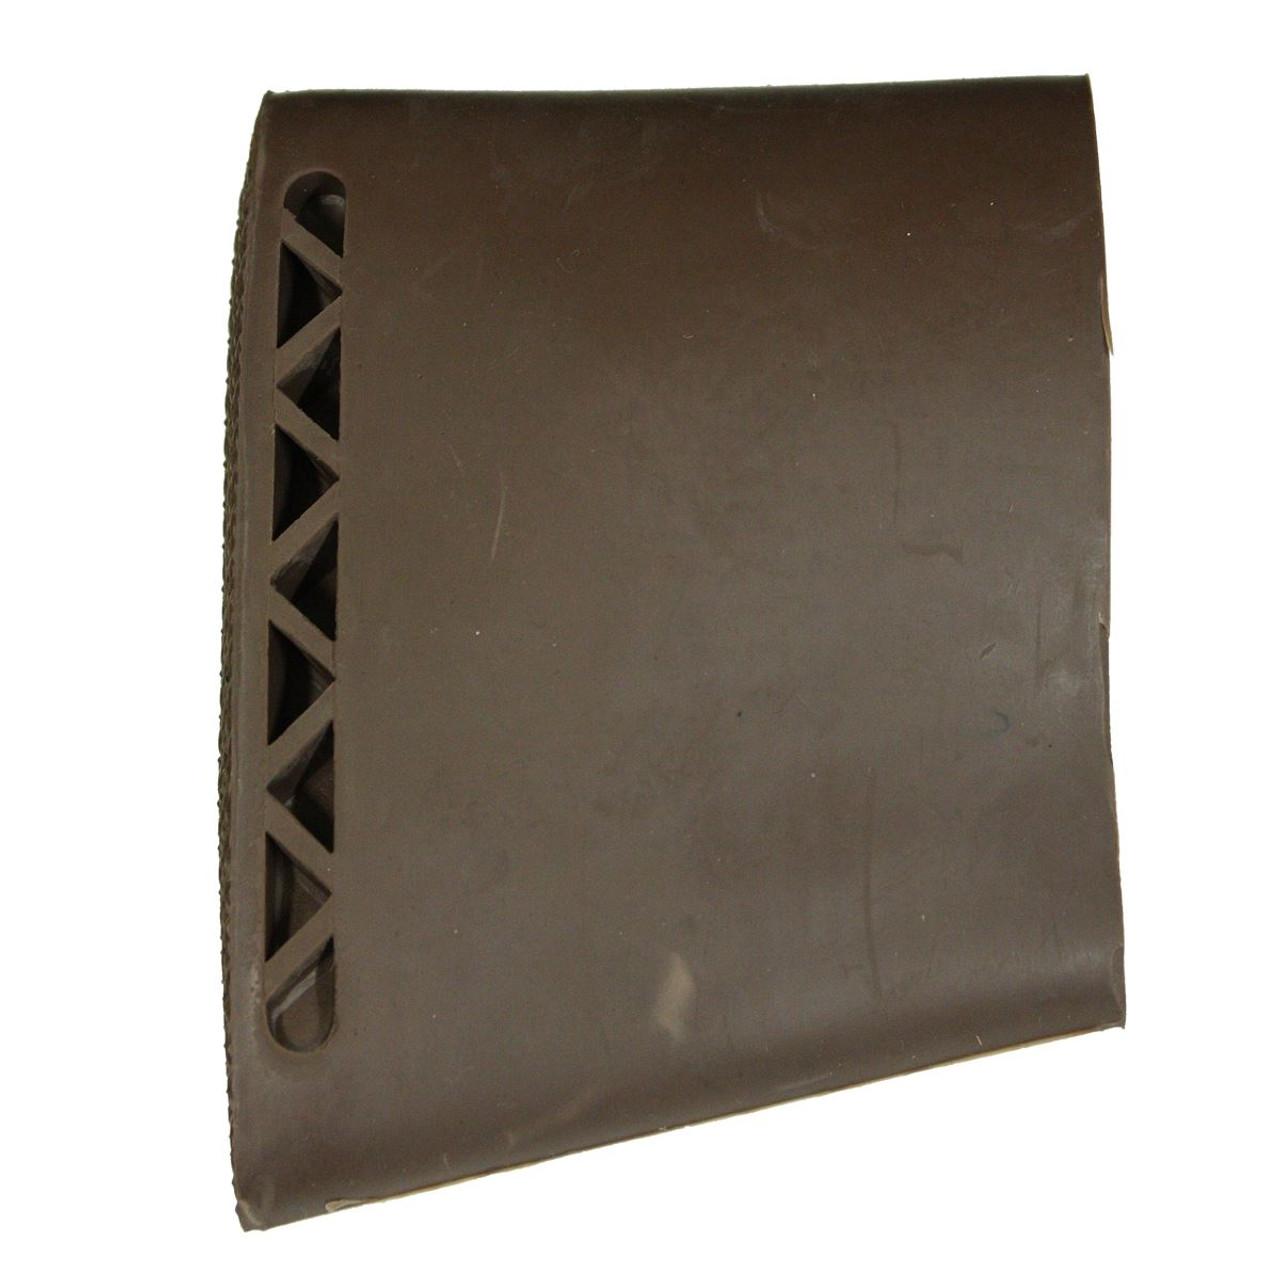 Bisley 10mm Slip On Recoil Pad